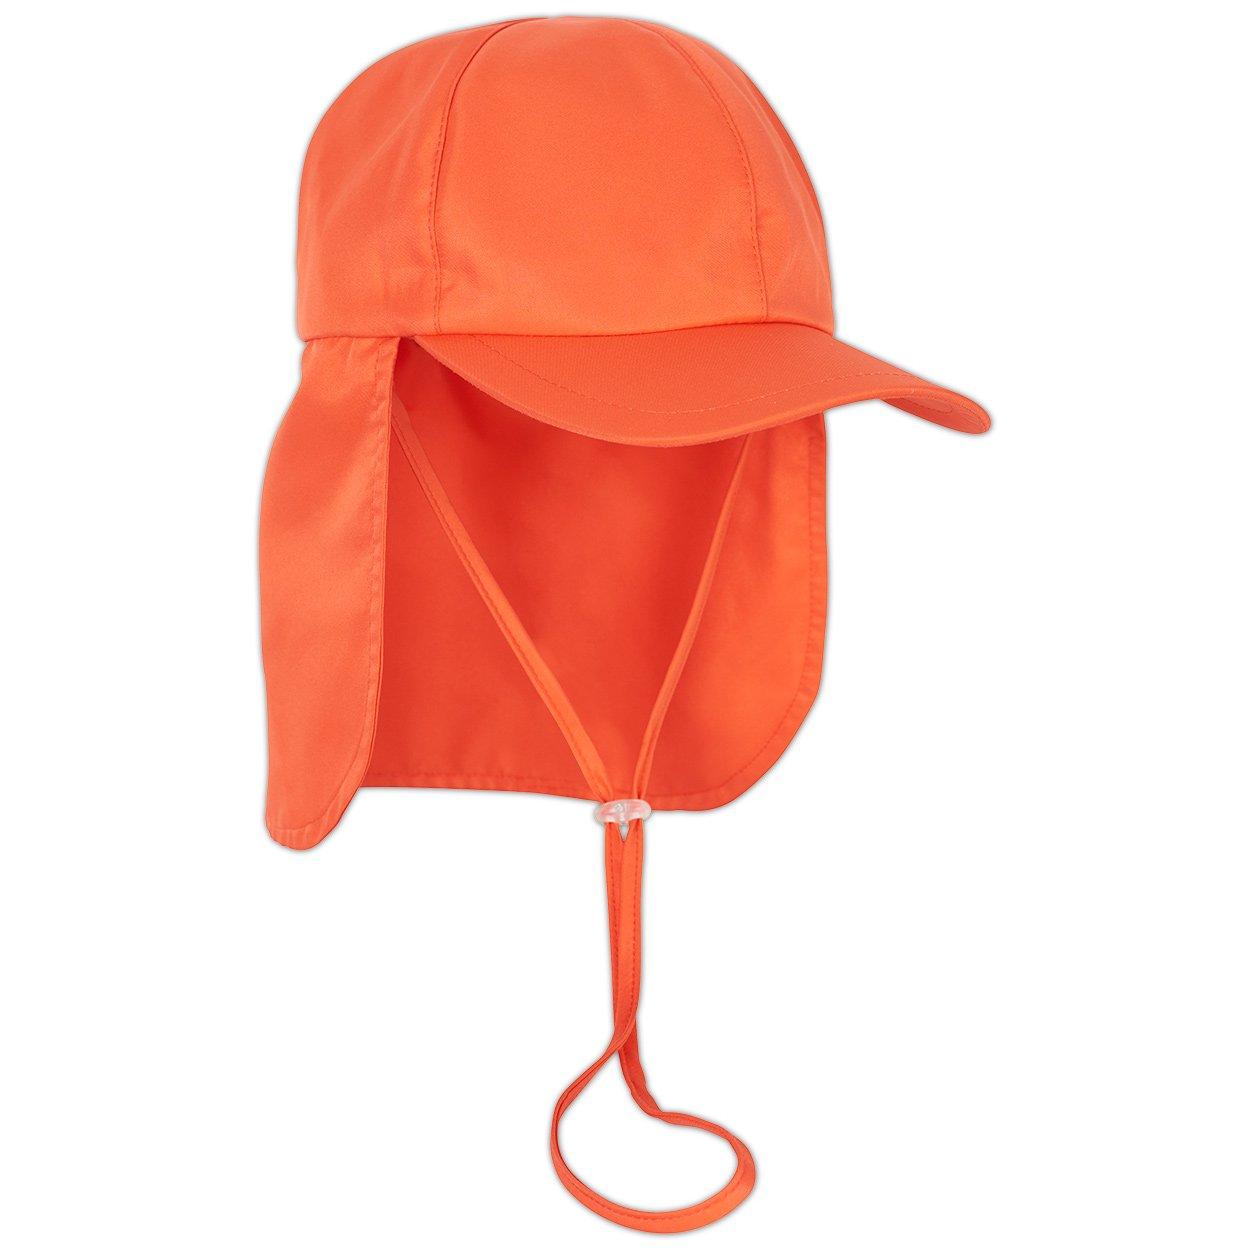 0c5e3ae097733 Kids Orange Legionnaire Sun Hat Upf 50 Size S Xl Boys Girls Unisex  Sunpoplife Right View